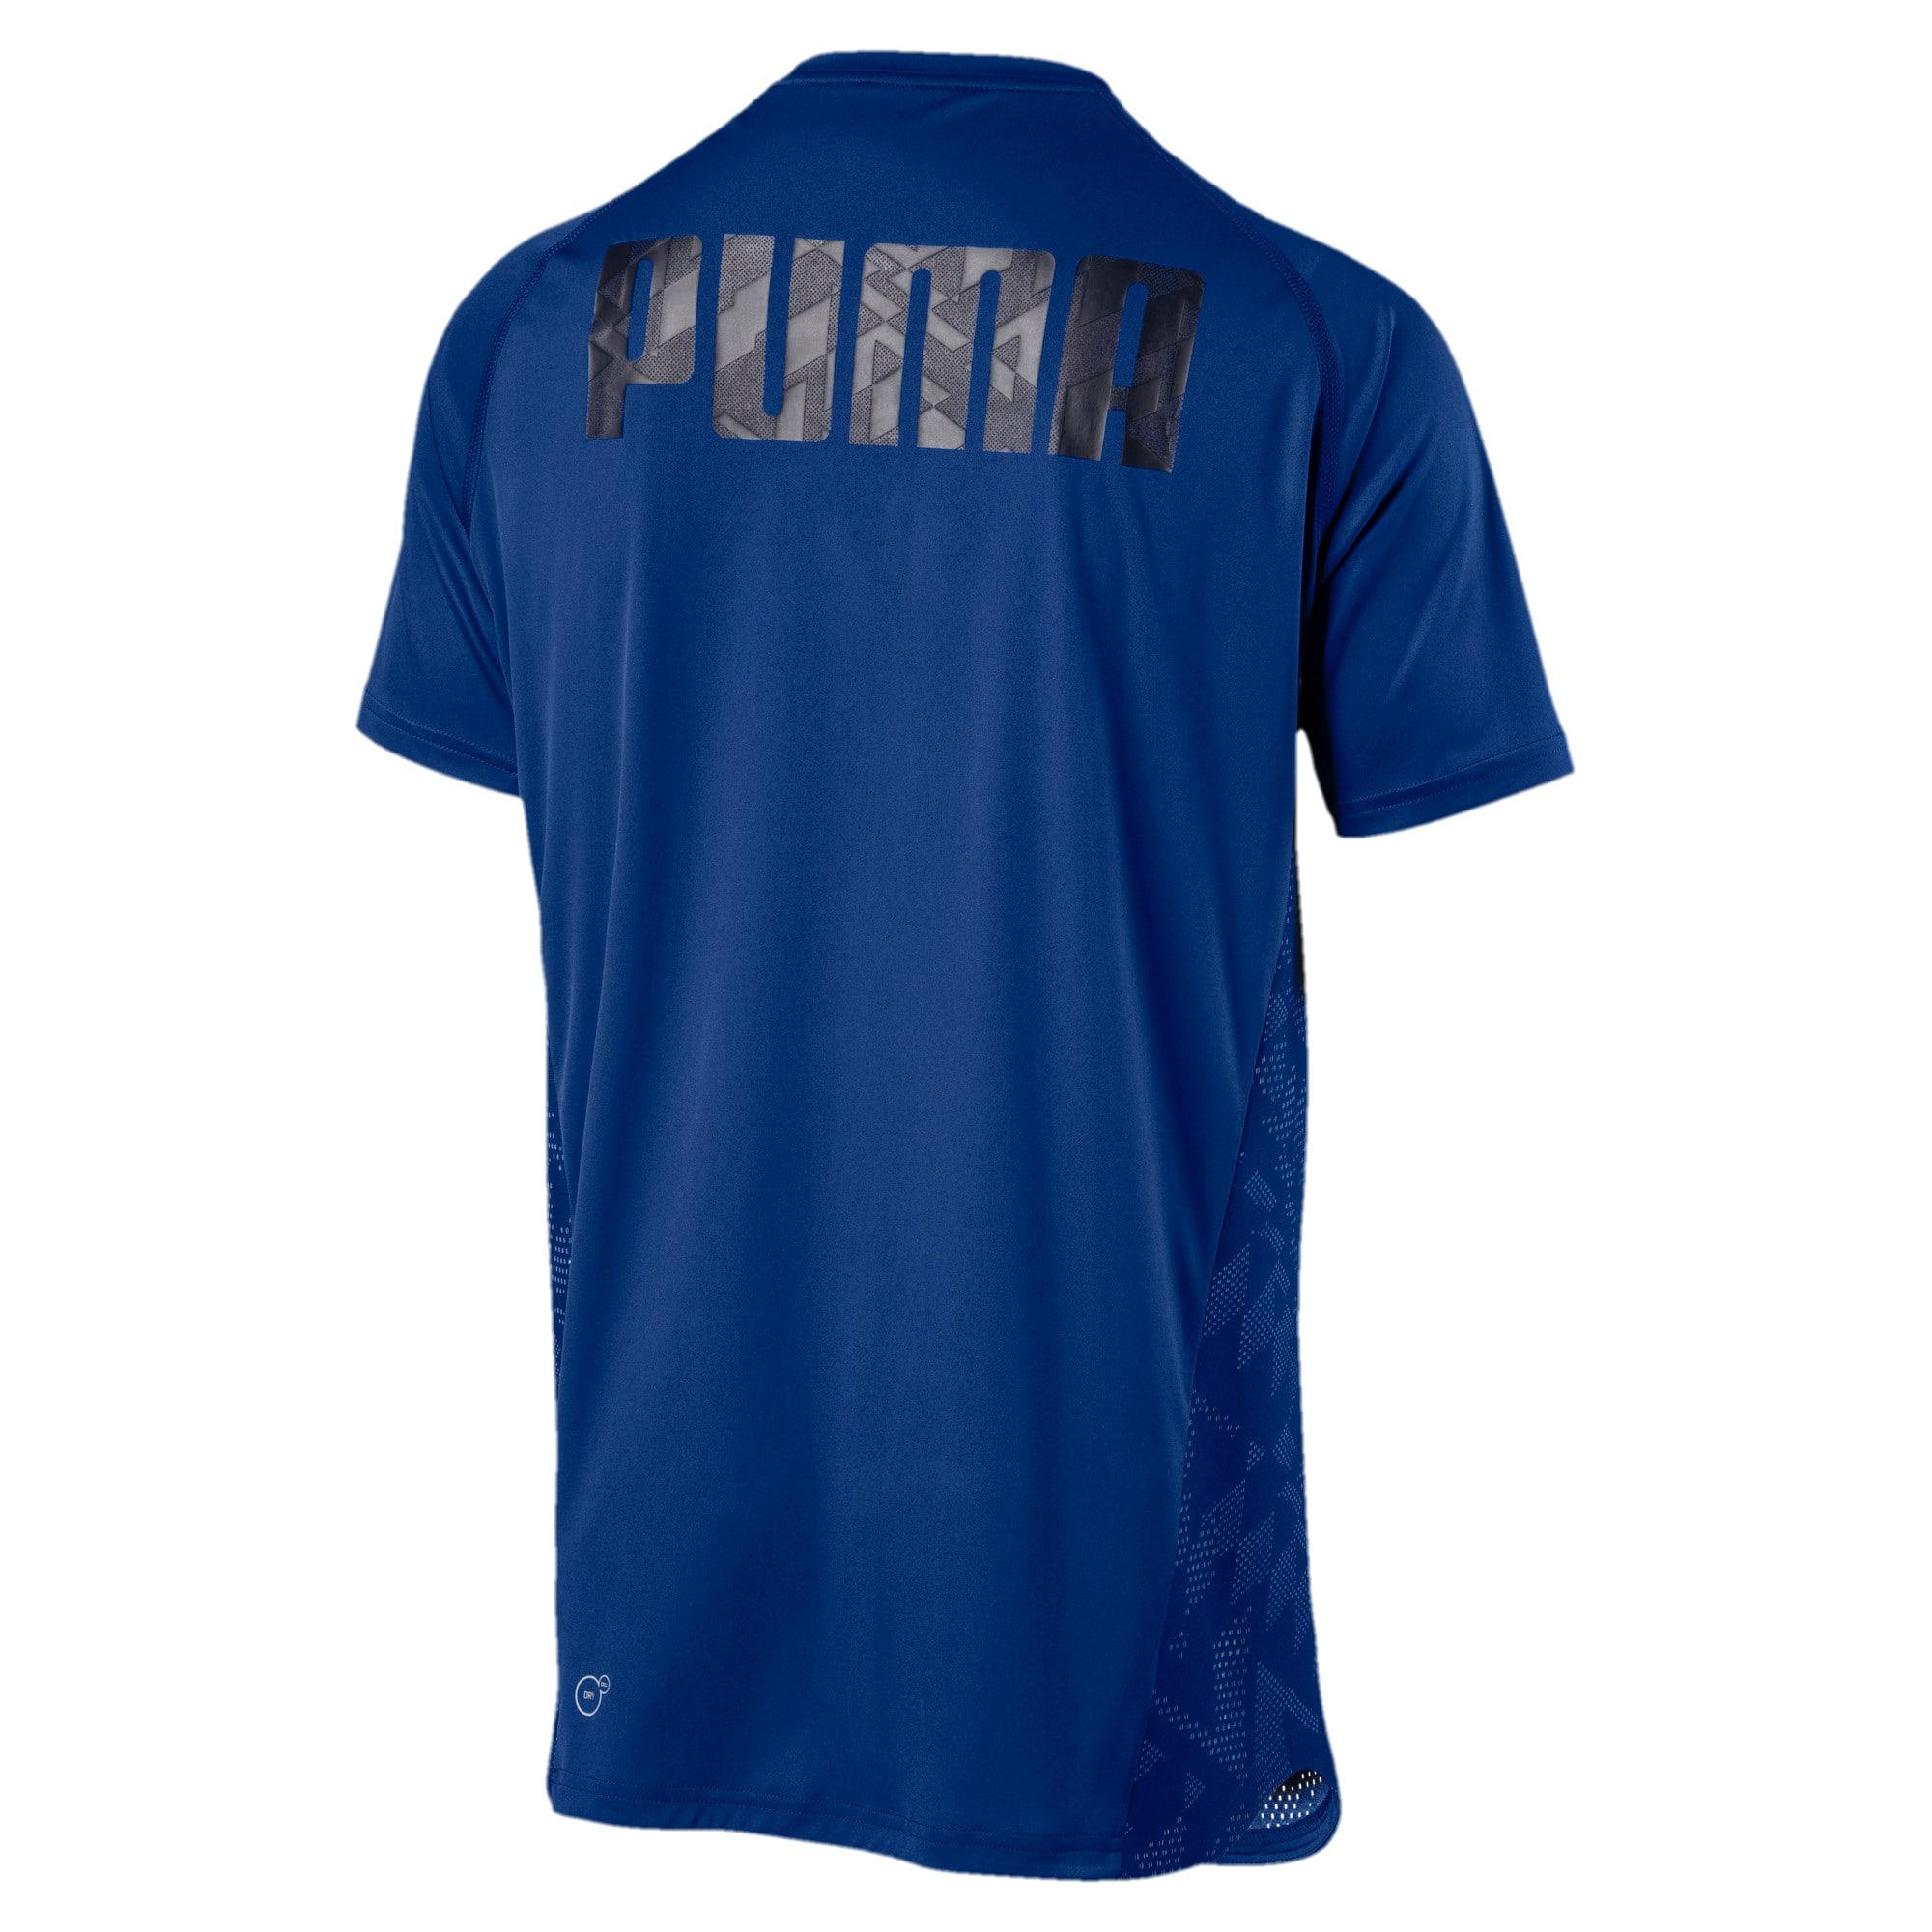 Thumbnail 3 of VENT Short Sleeve Men's Training Top, Sodalite Blue, medium